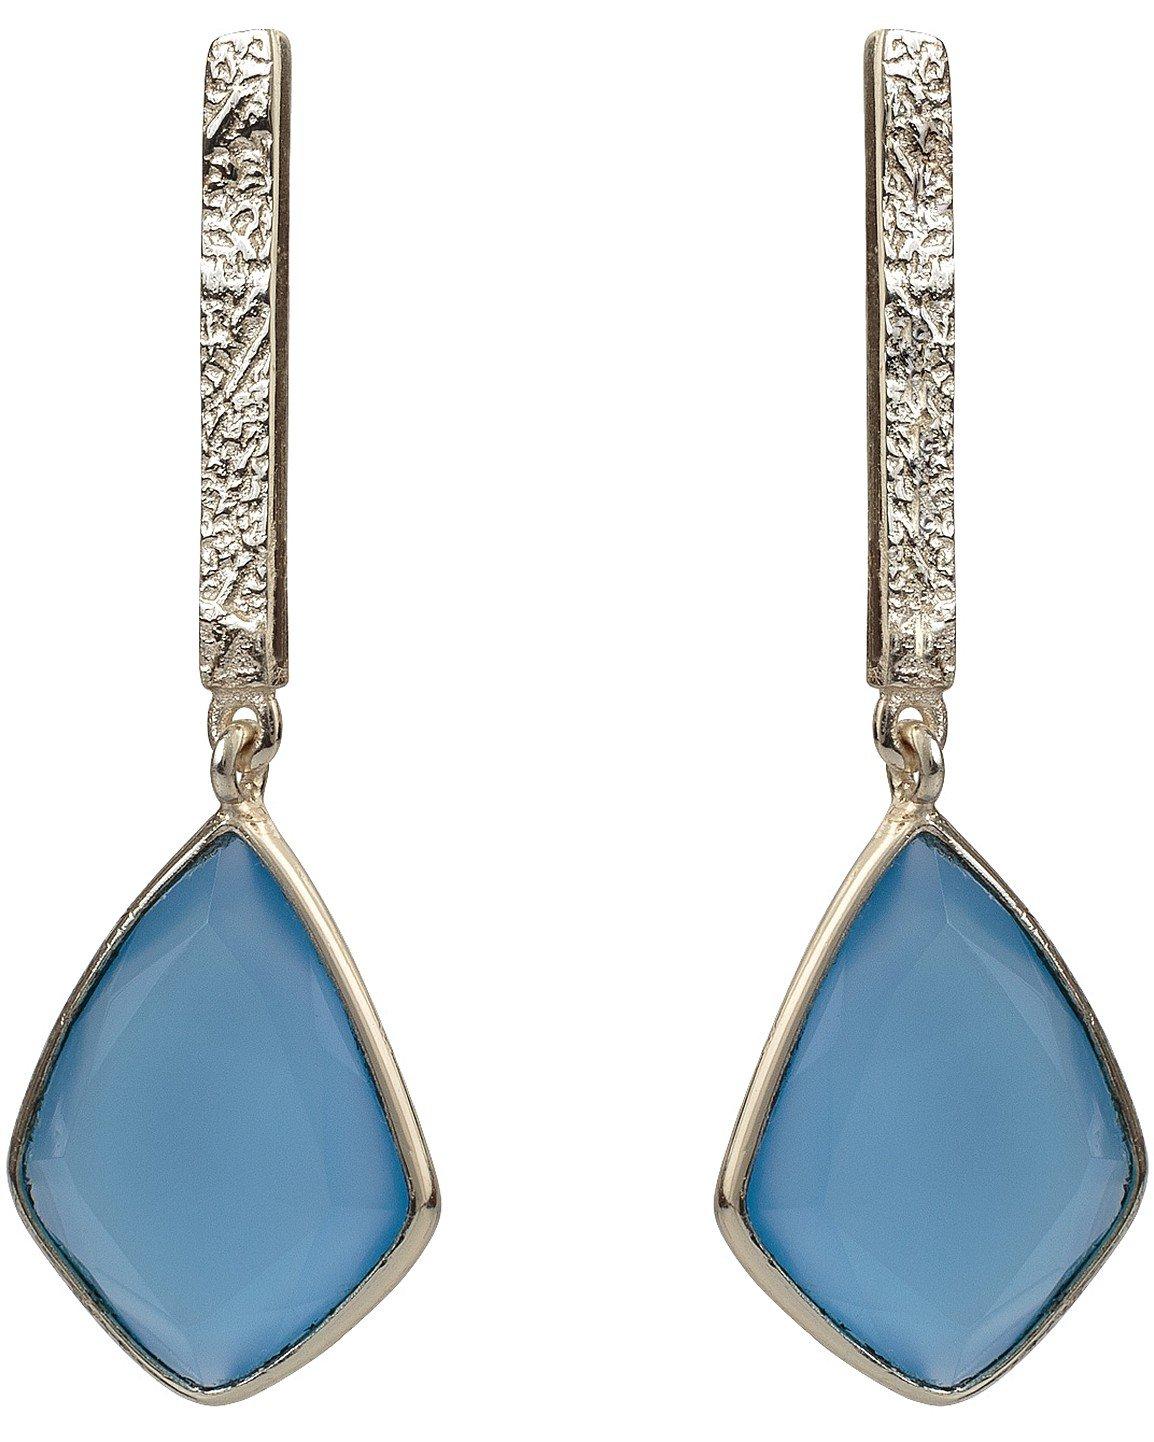 66aa799aa Blue Calci & Gold Plated Drop Earrings